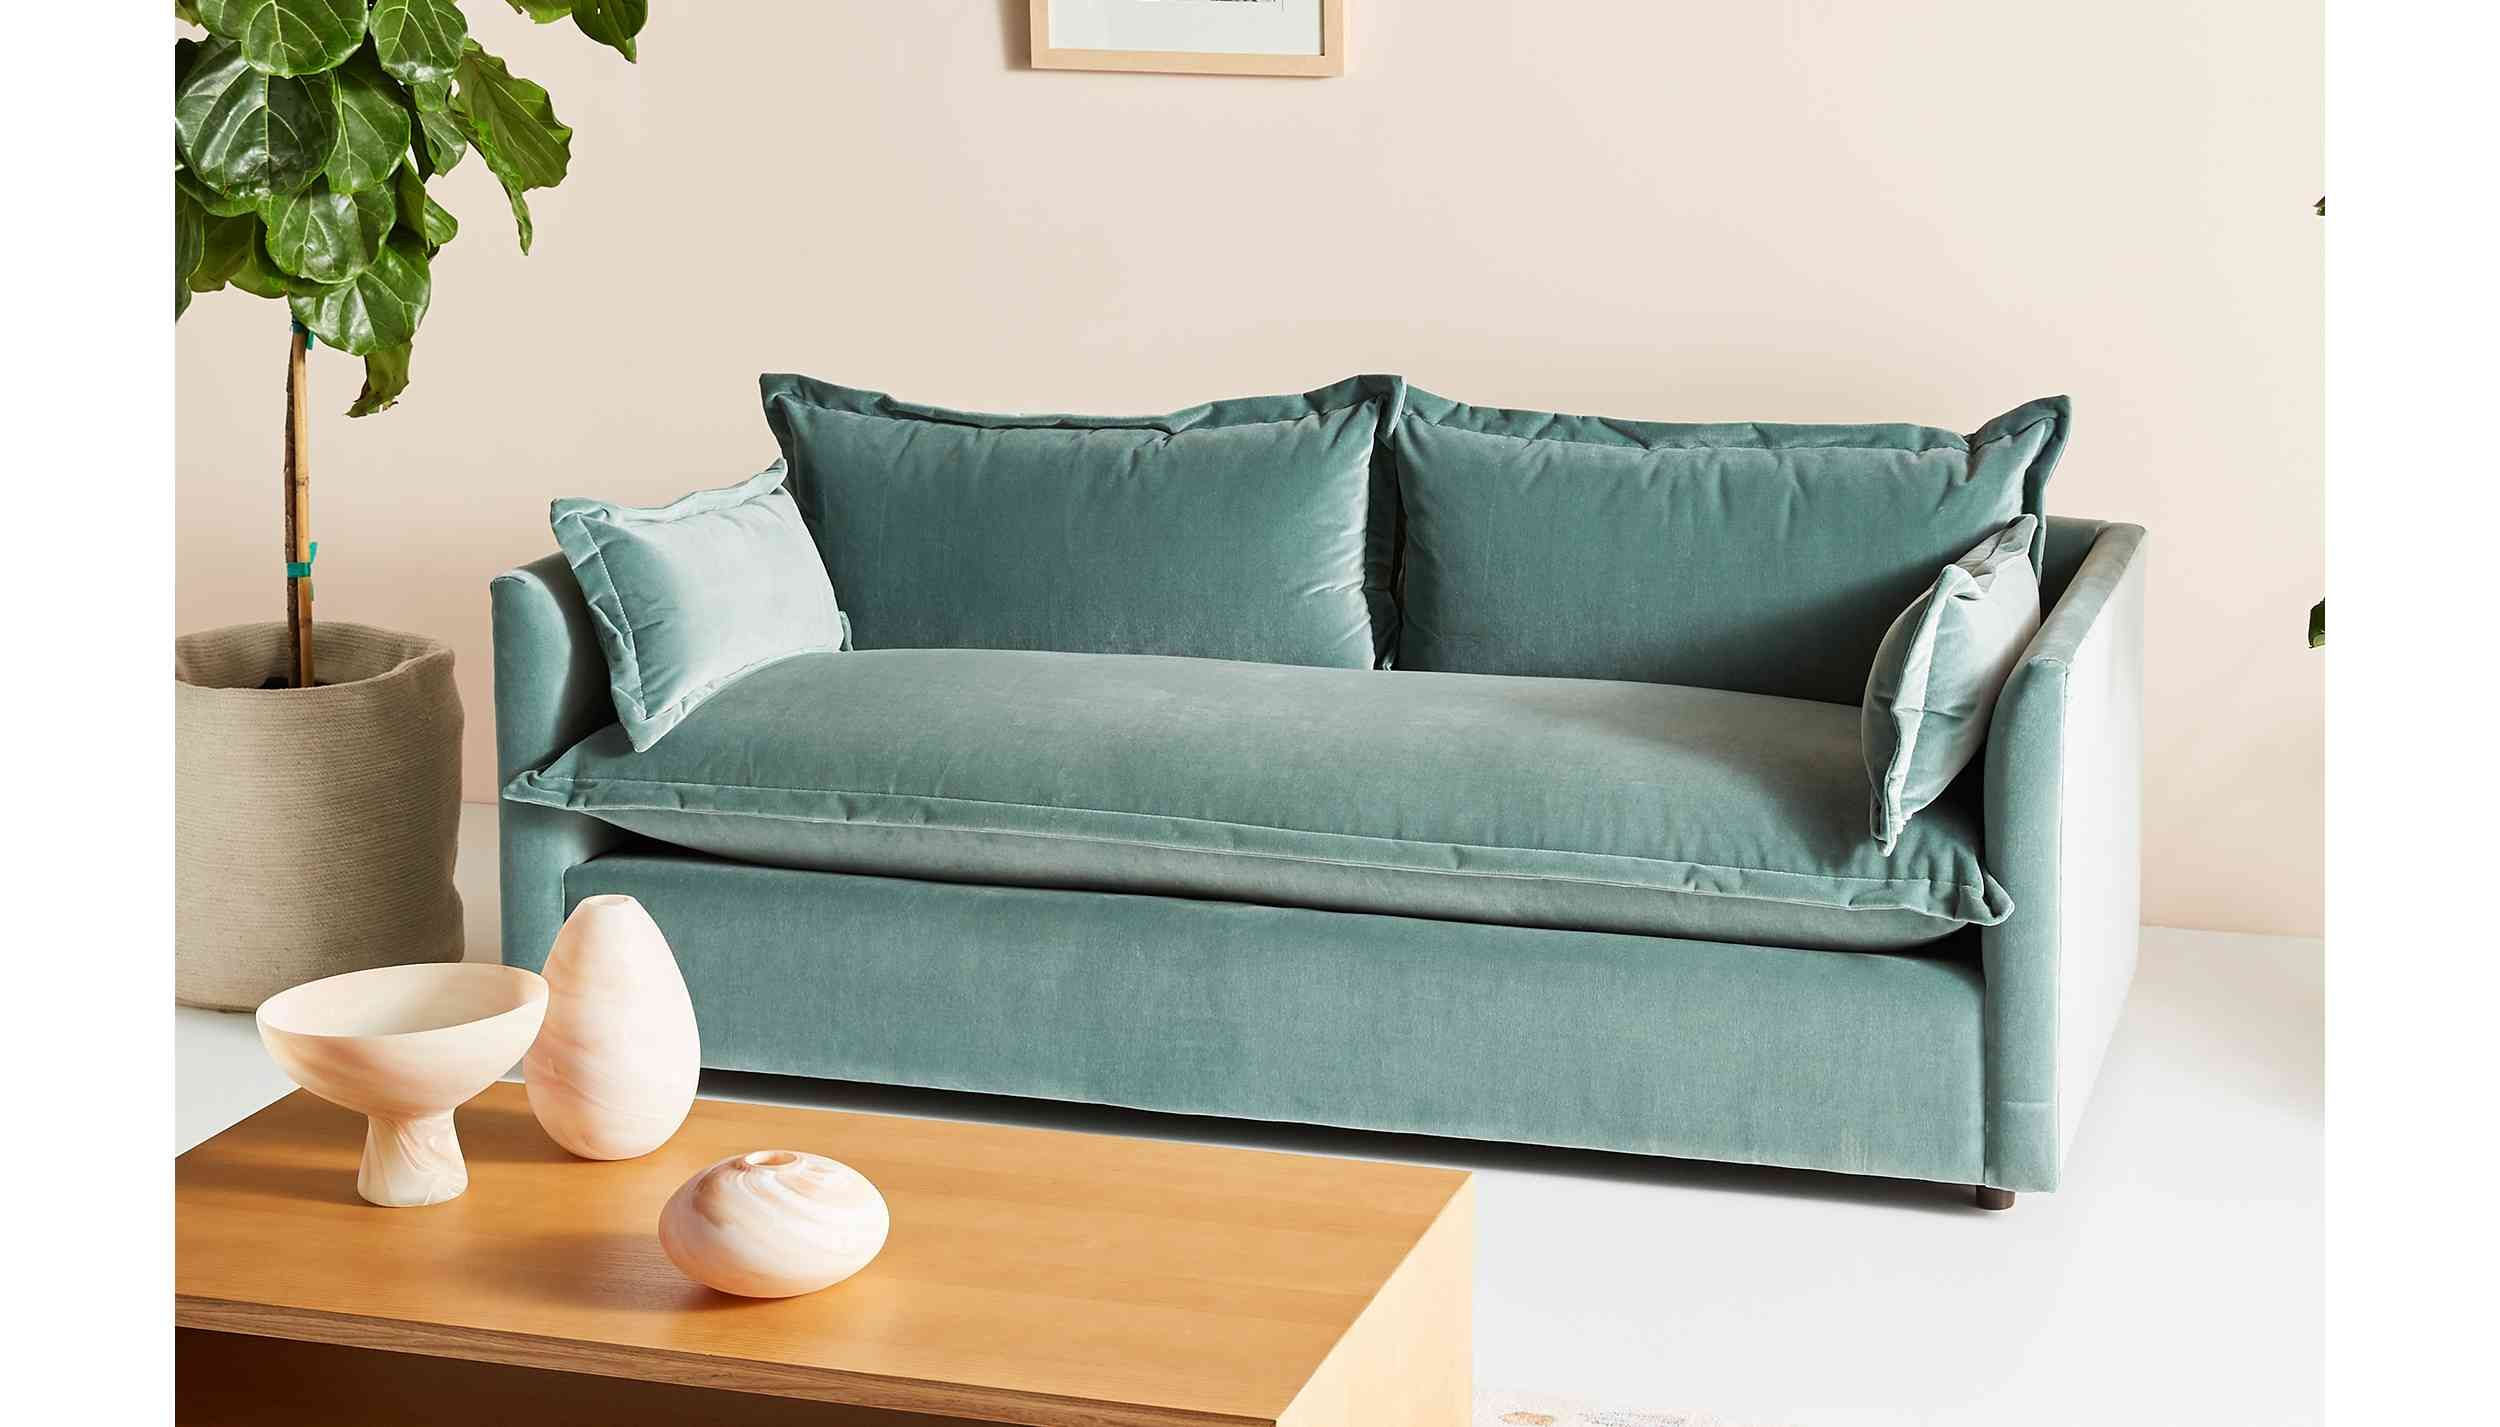 Denver Sofa | living room | Sofa, Settee sofa, Sofa furniture